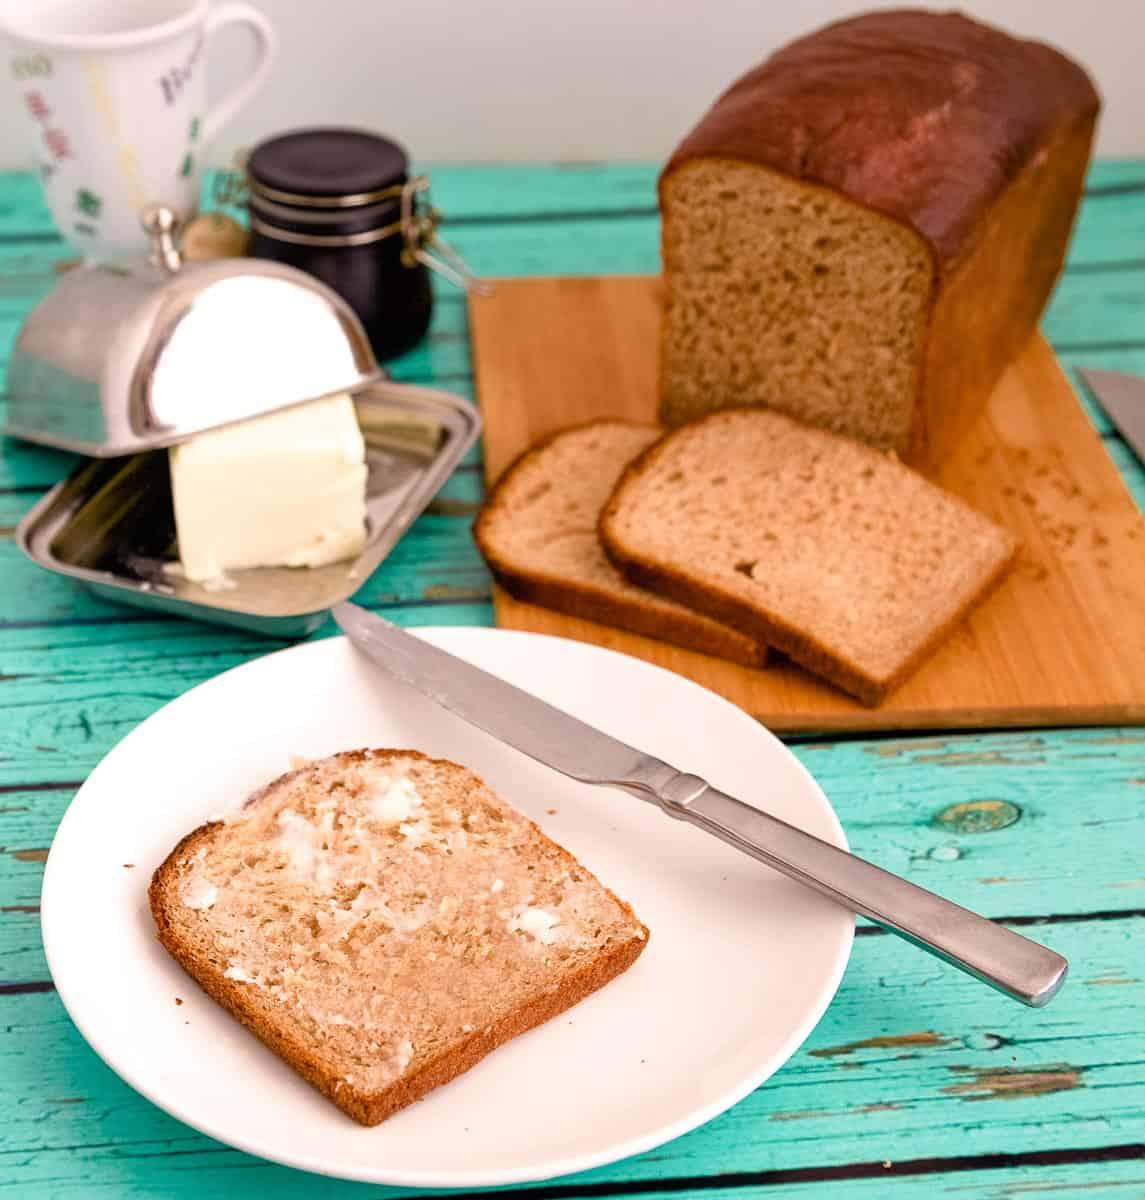 A buttered slice of sandwich bread.